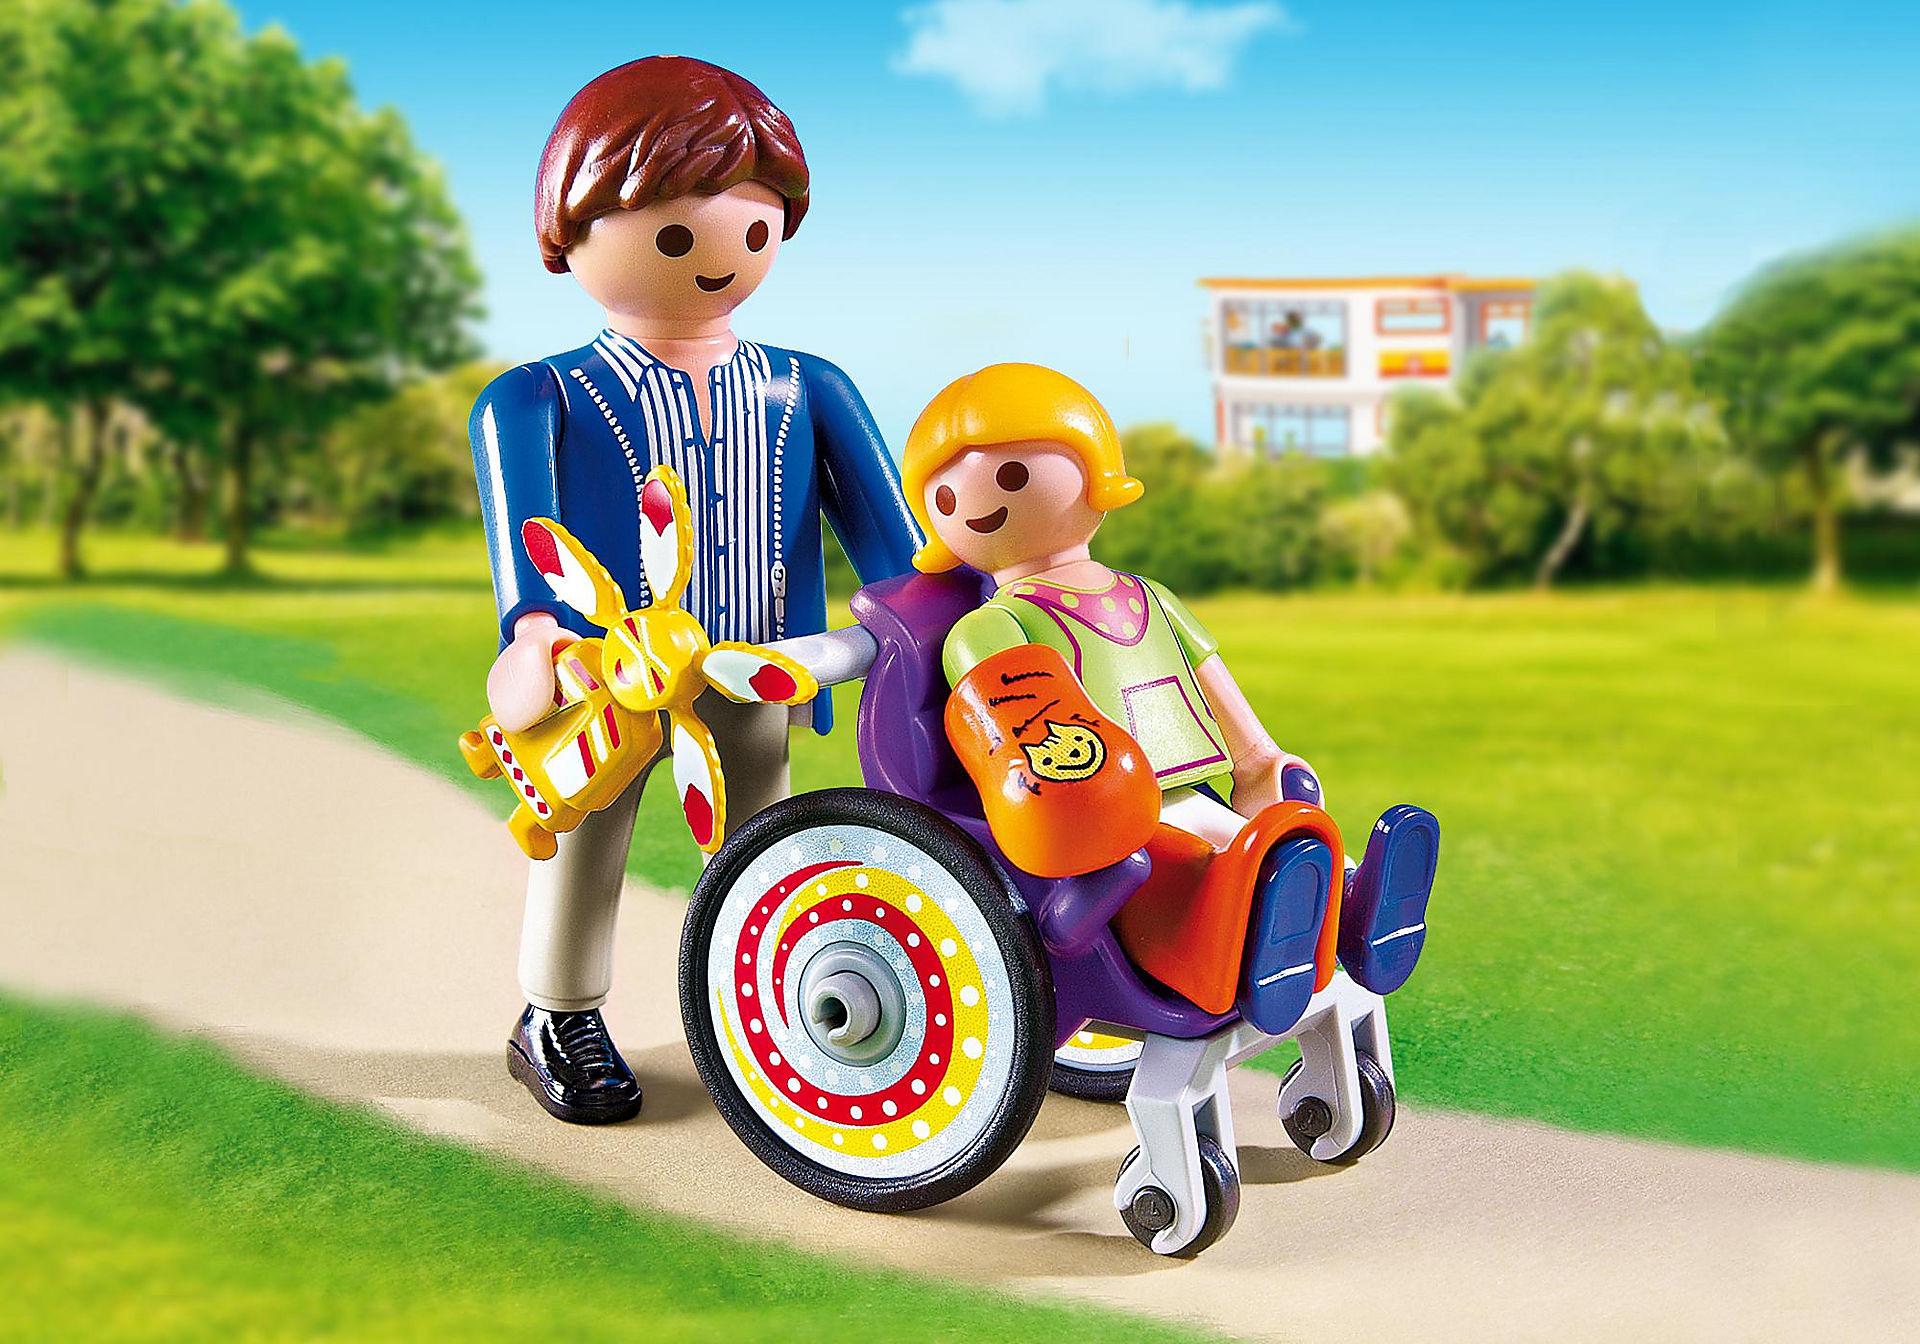 6663 Barn i rullstol zoom image1